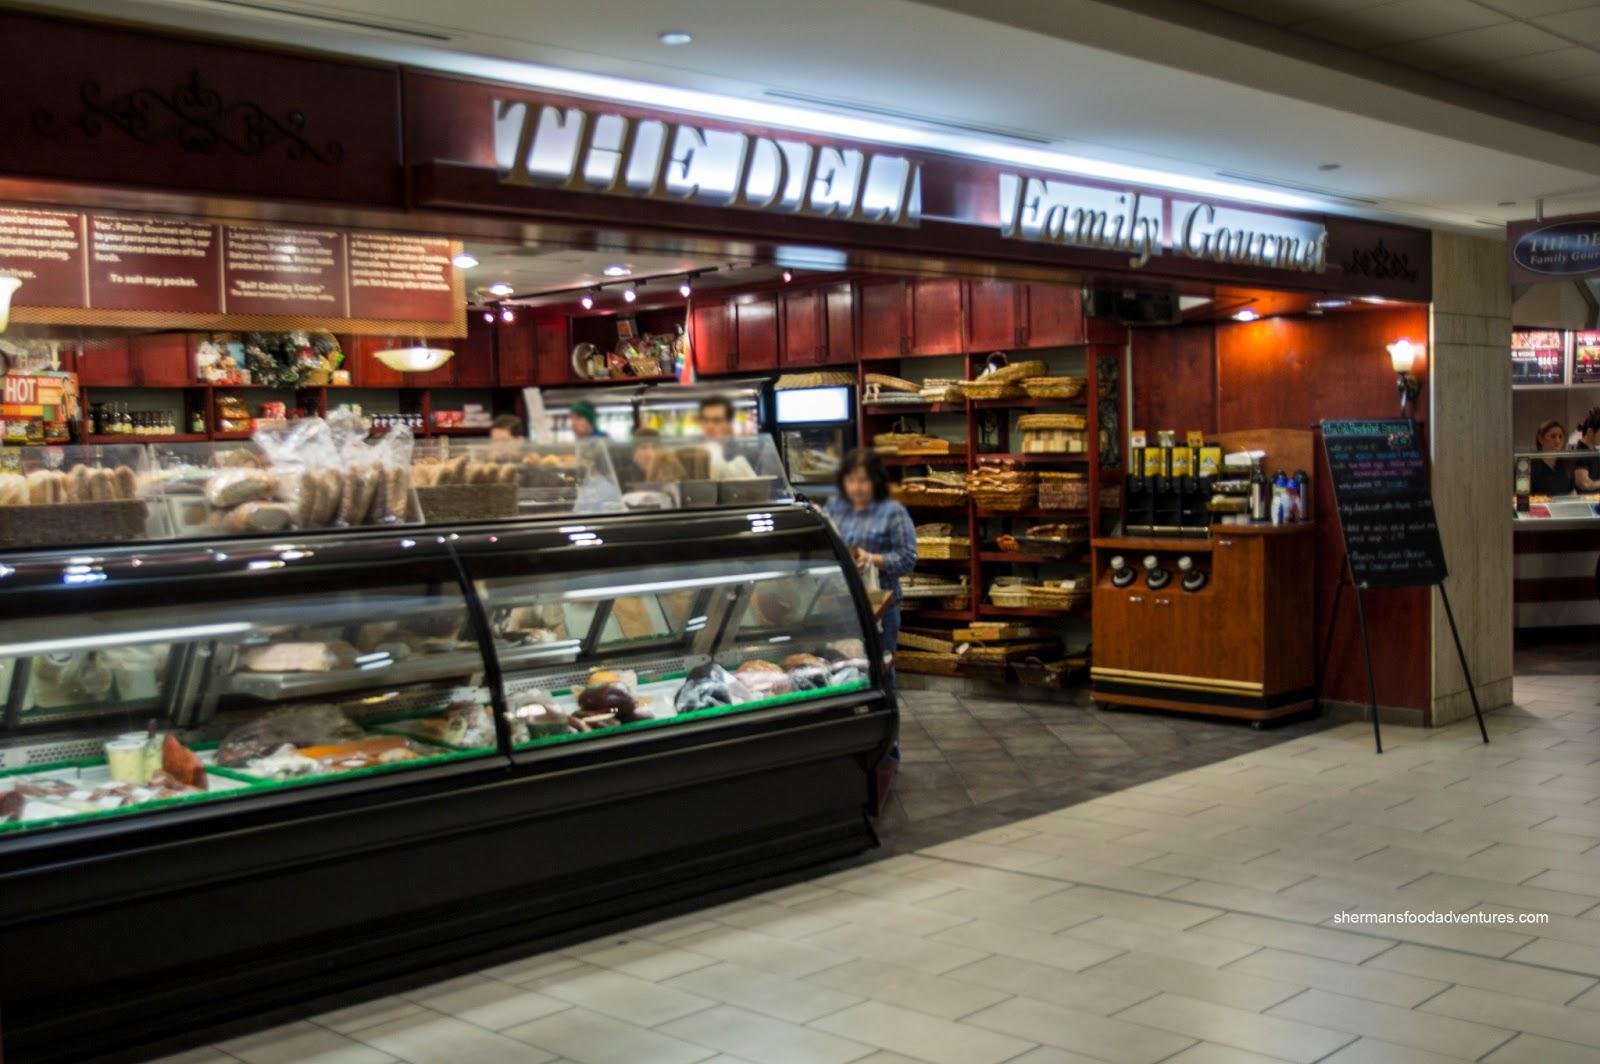 Shermans Food Adventures: Family Gourmet Deli (Royal Centre)